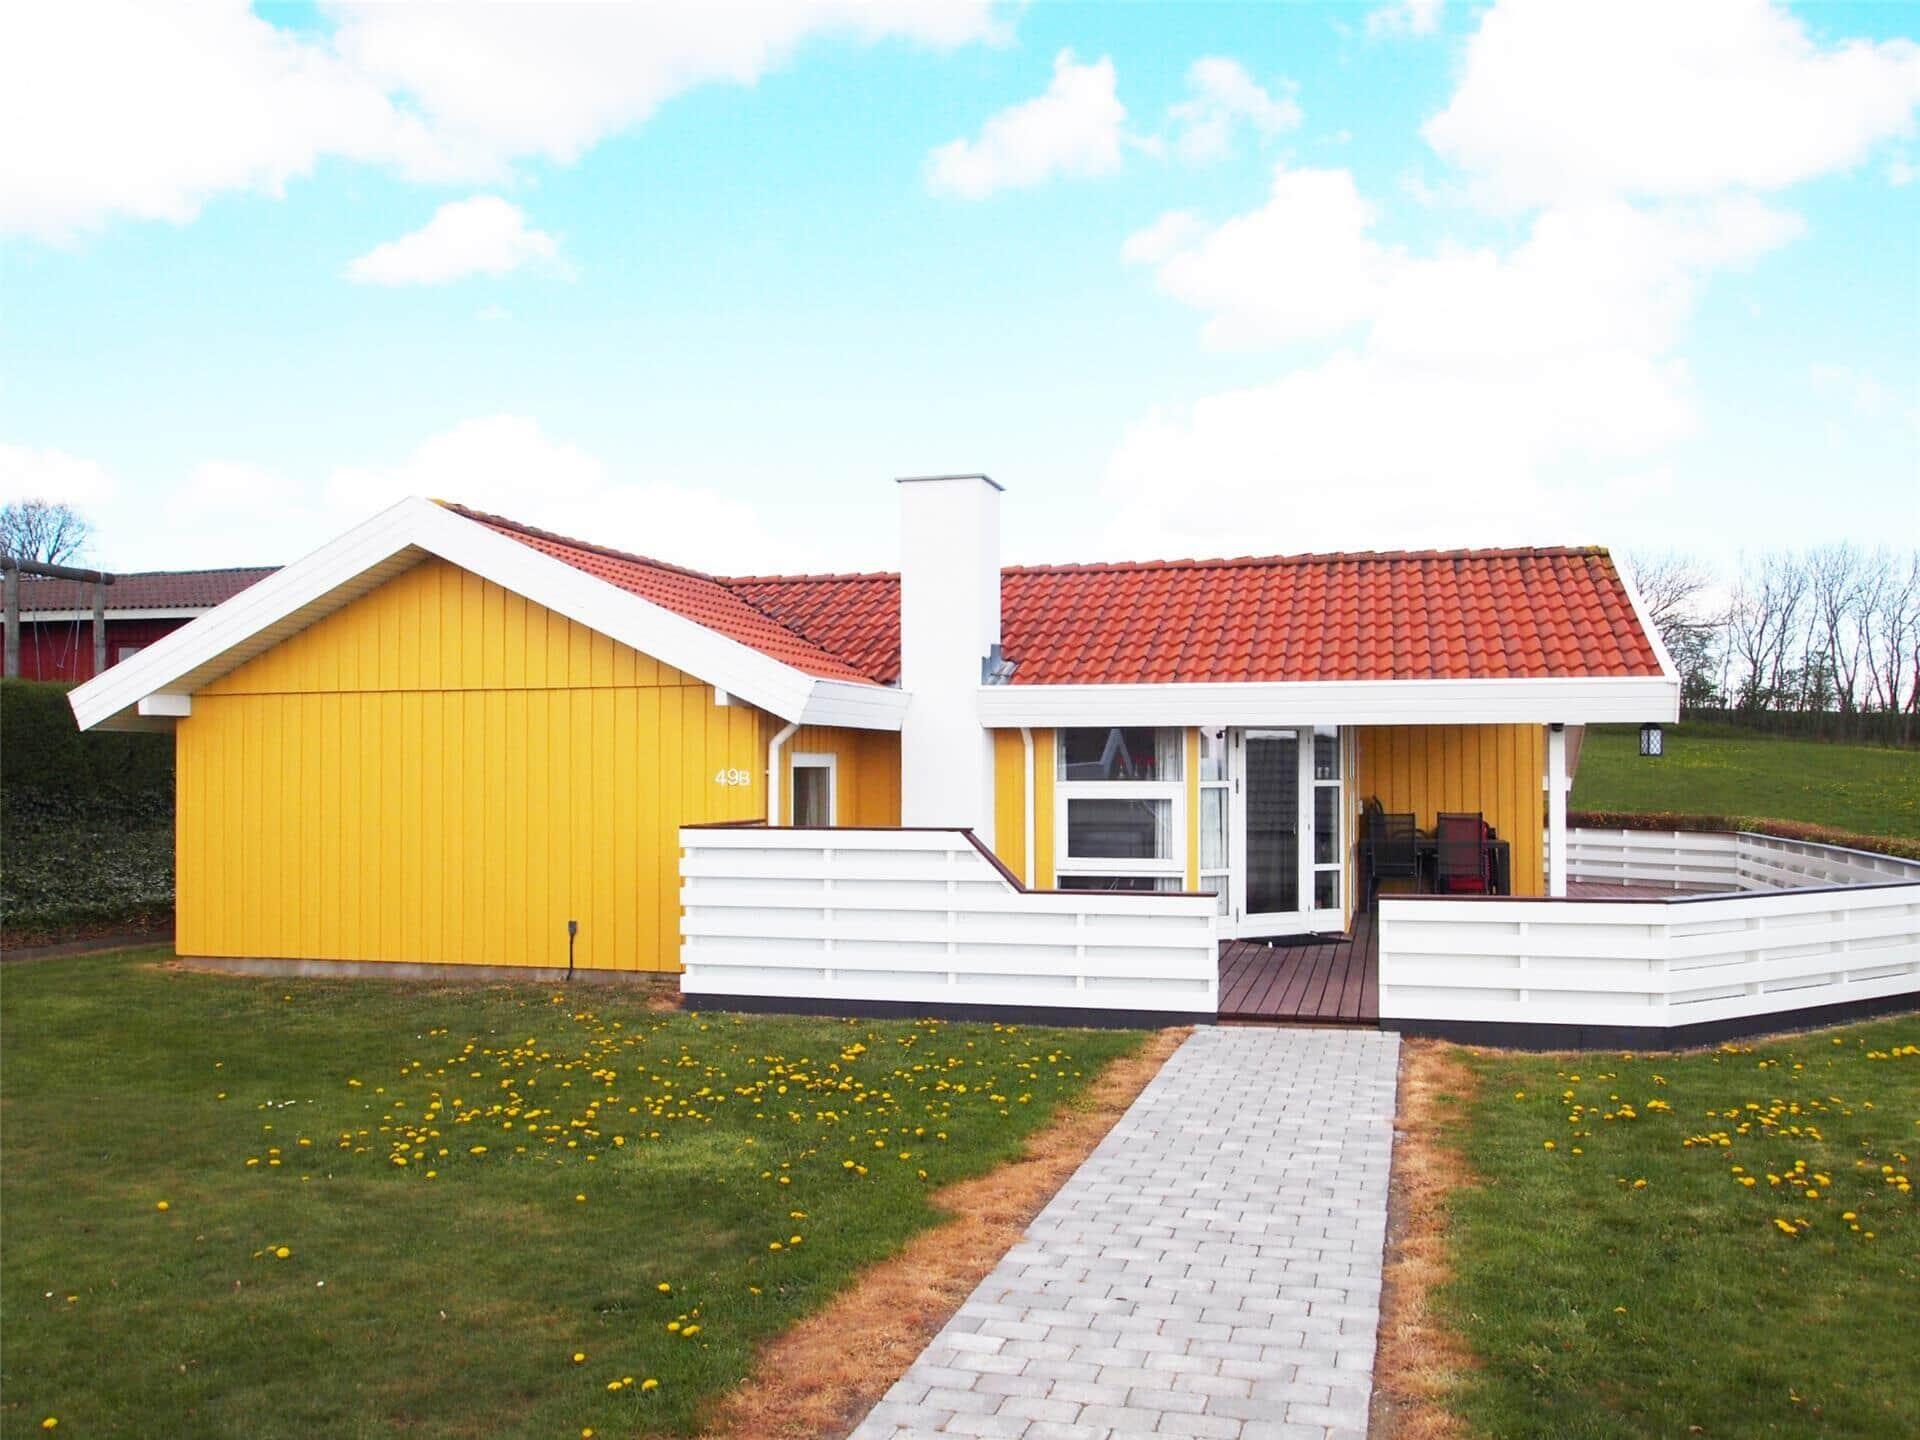 Bild 1-3 Ferienhaus F503520, Trappendalvej 49, DK - 6094 Hejls